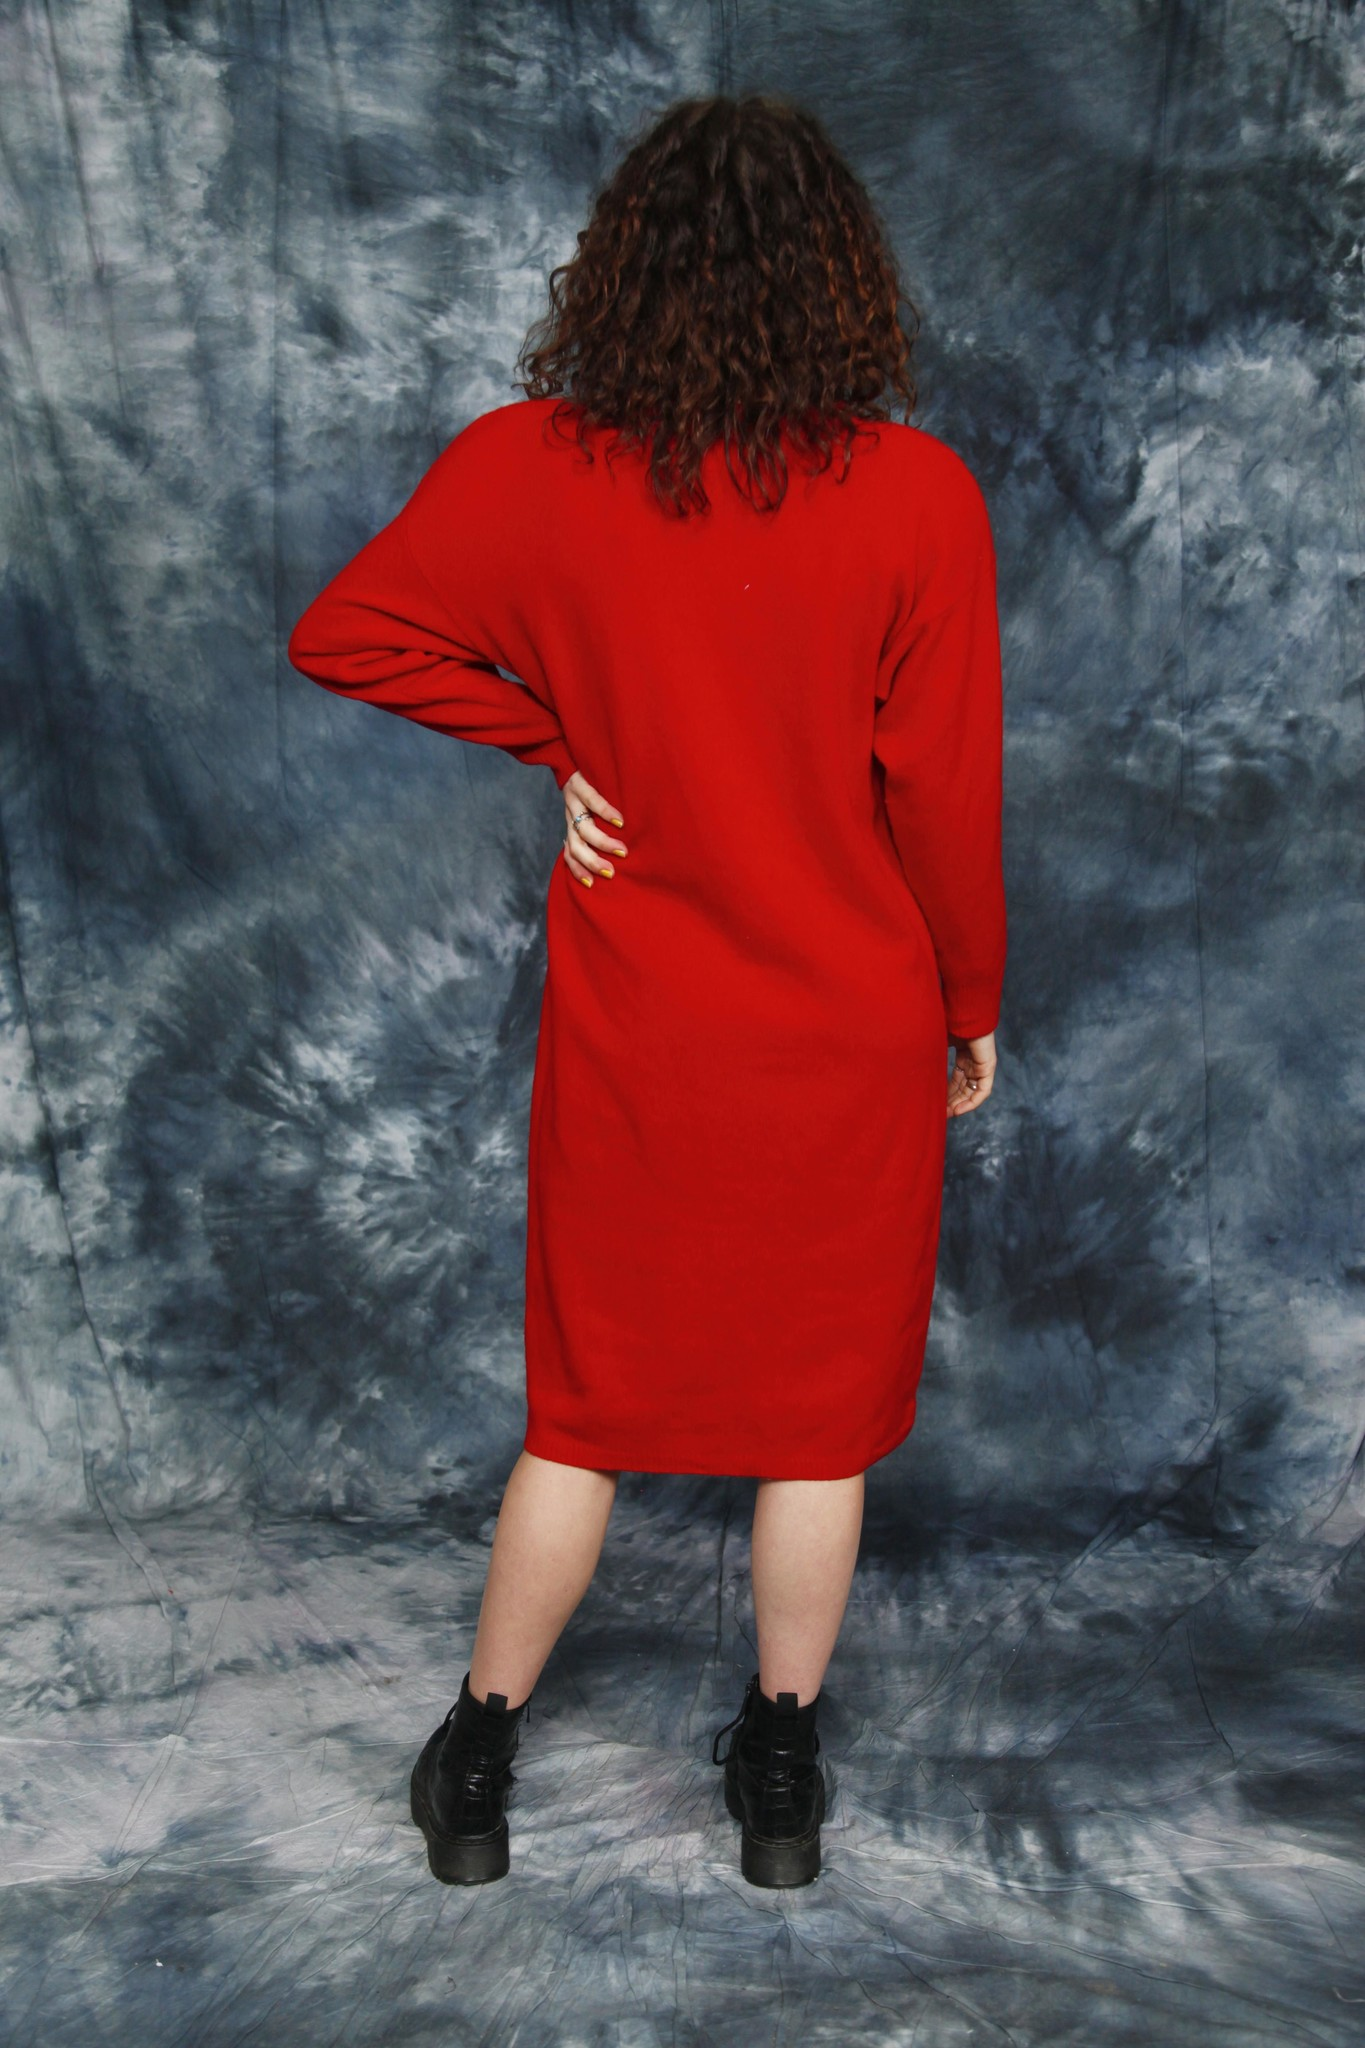 Red 80s winter dress